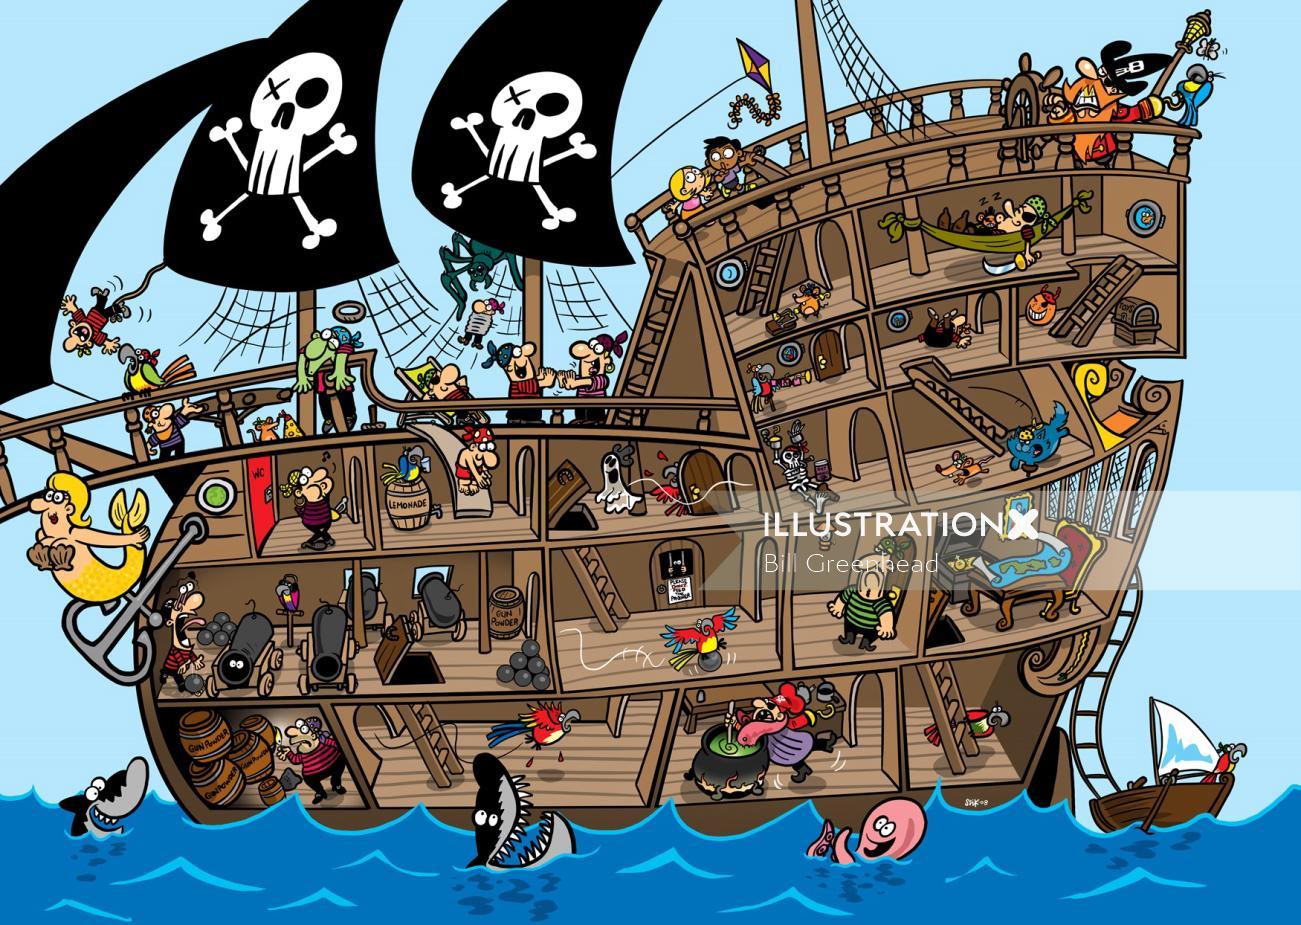 Pirate Ship for Sky Kids Magazine by Bill Greenhead